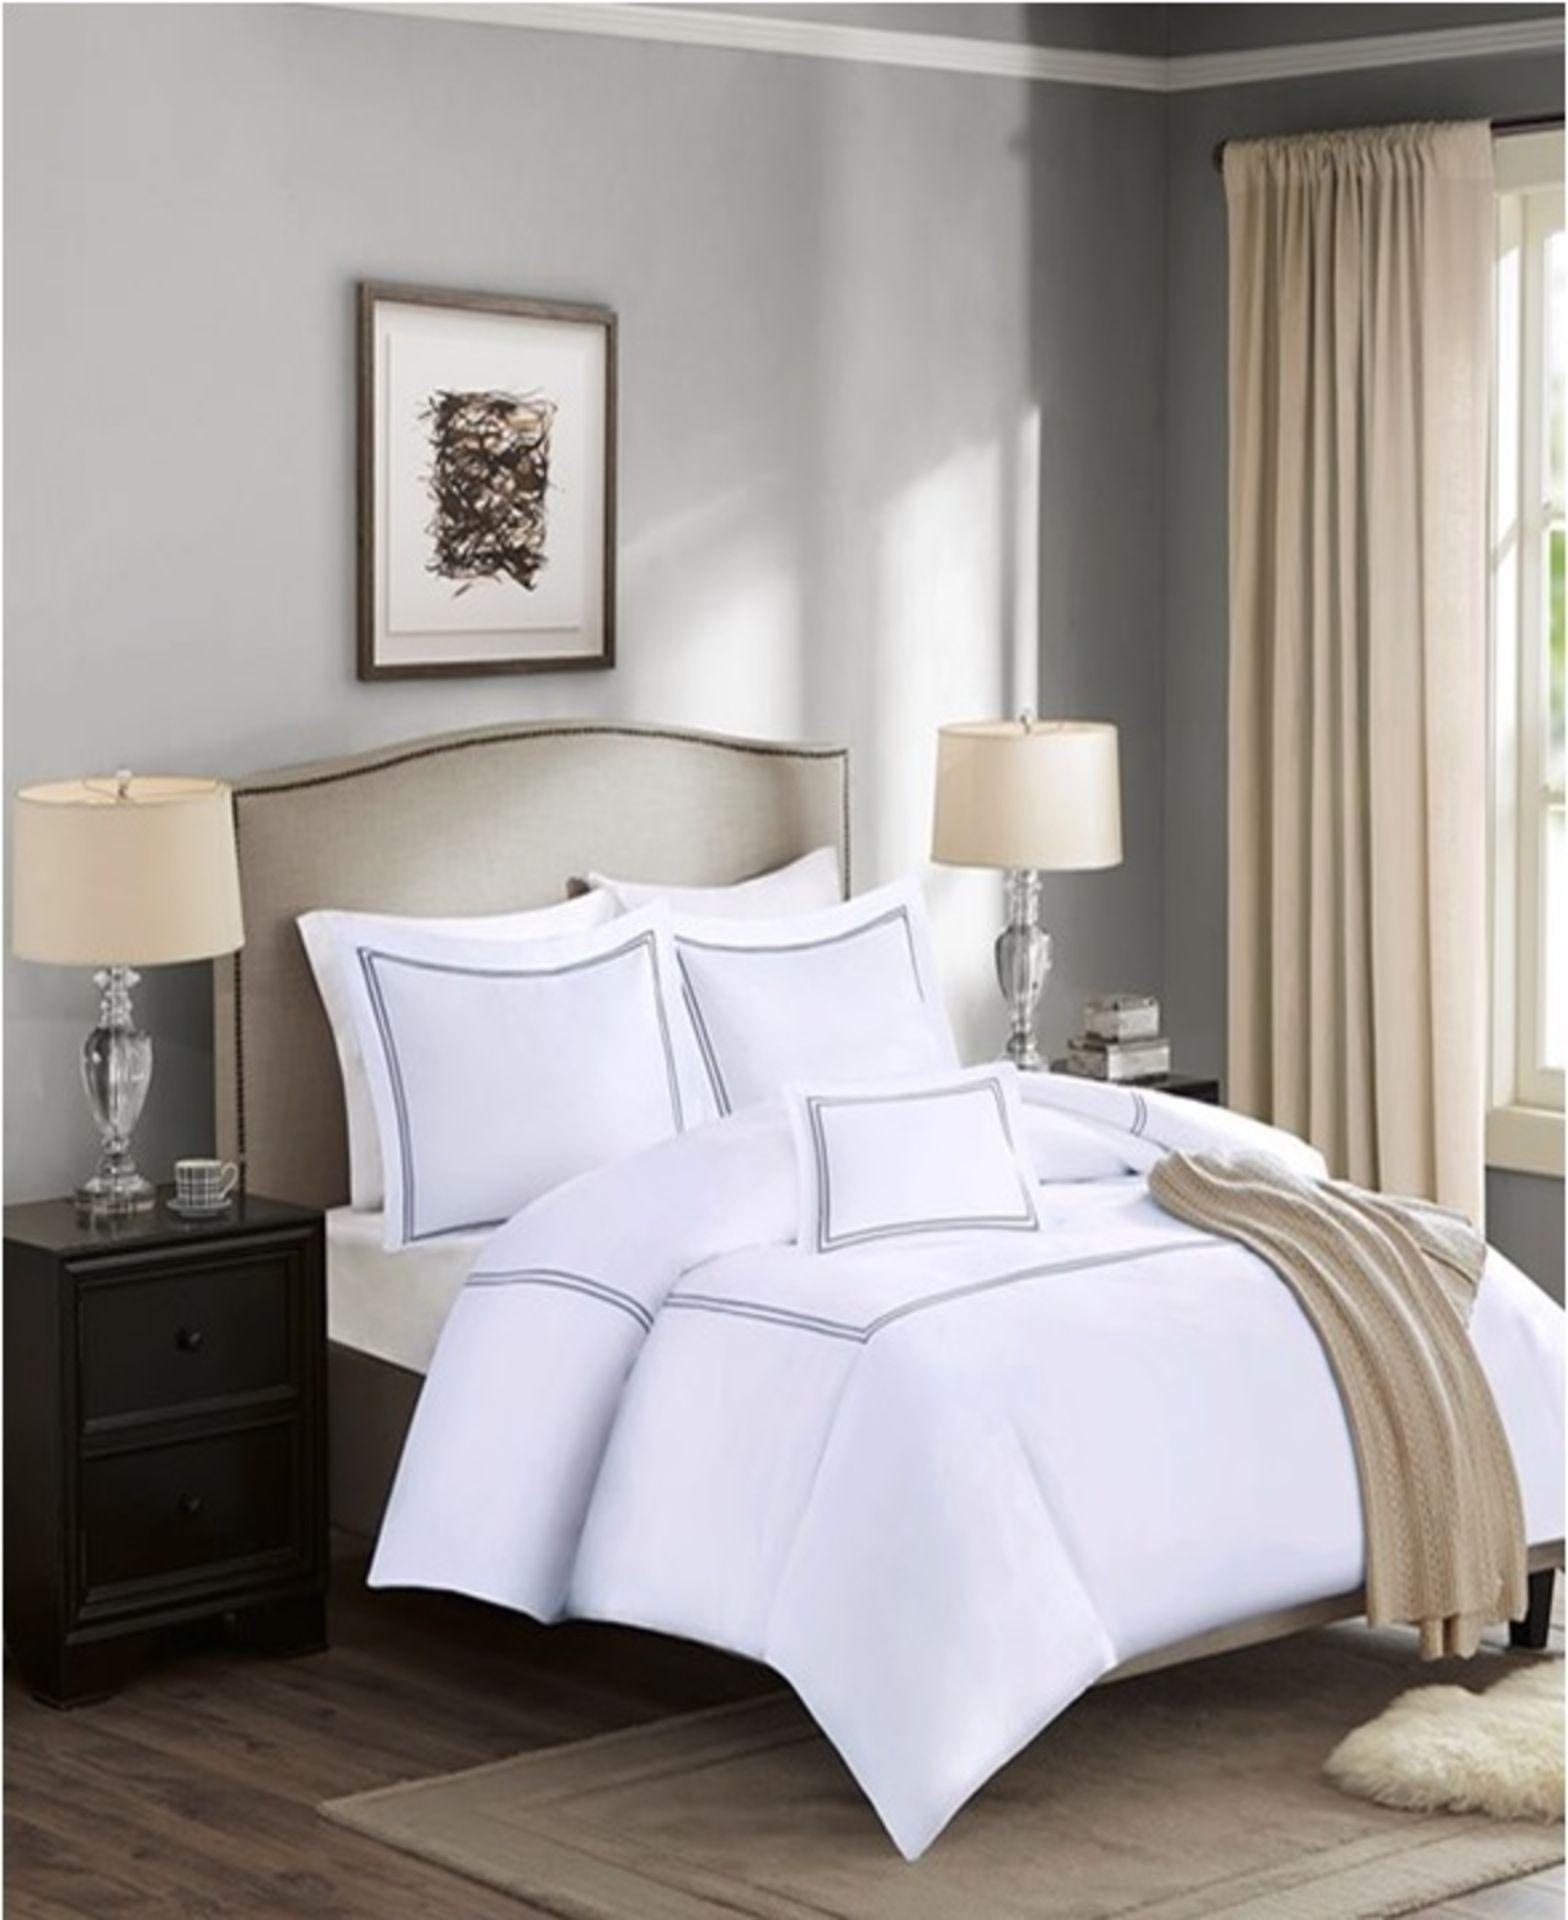 Lot 161 - 1 x Madison Park Luxury Collection King Duvet Set White - Product Code MP12-0199UK (Brand New -